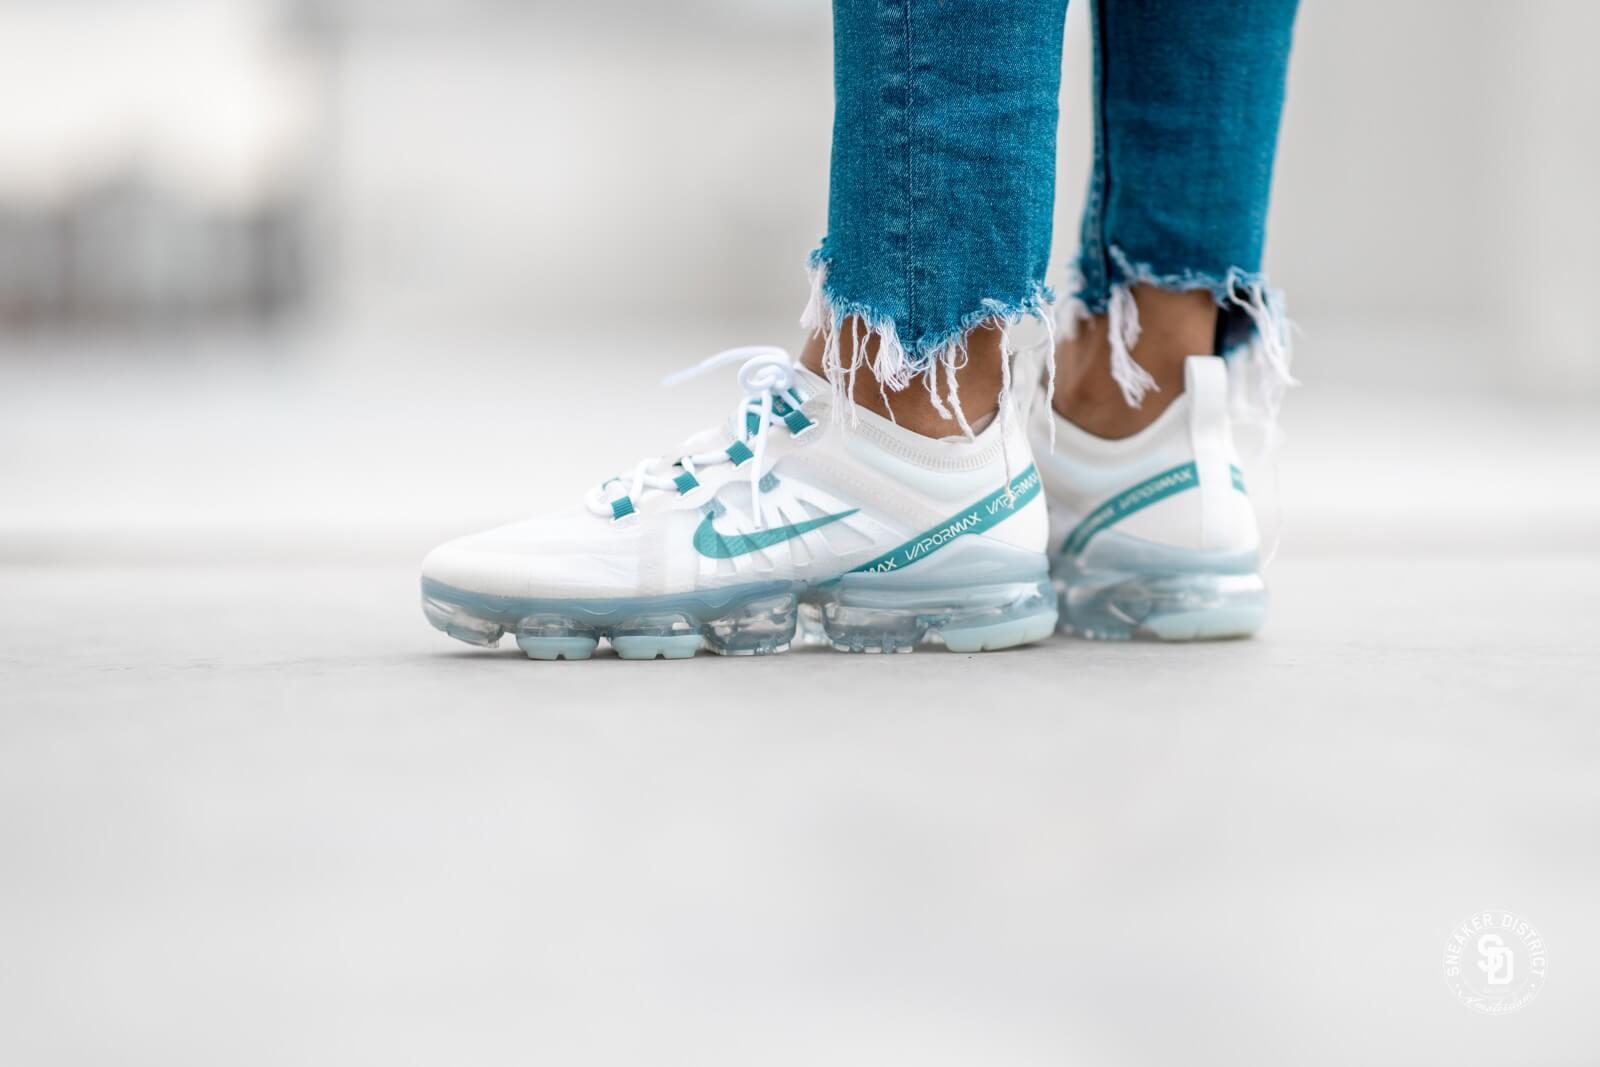 Nike Air VaporMax 2019 Schoen Zilver